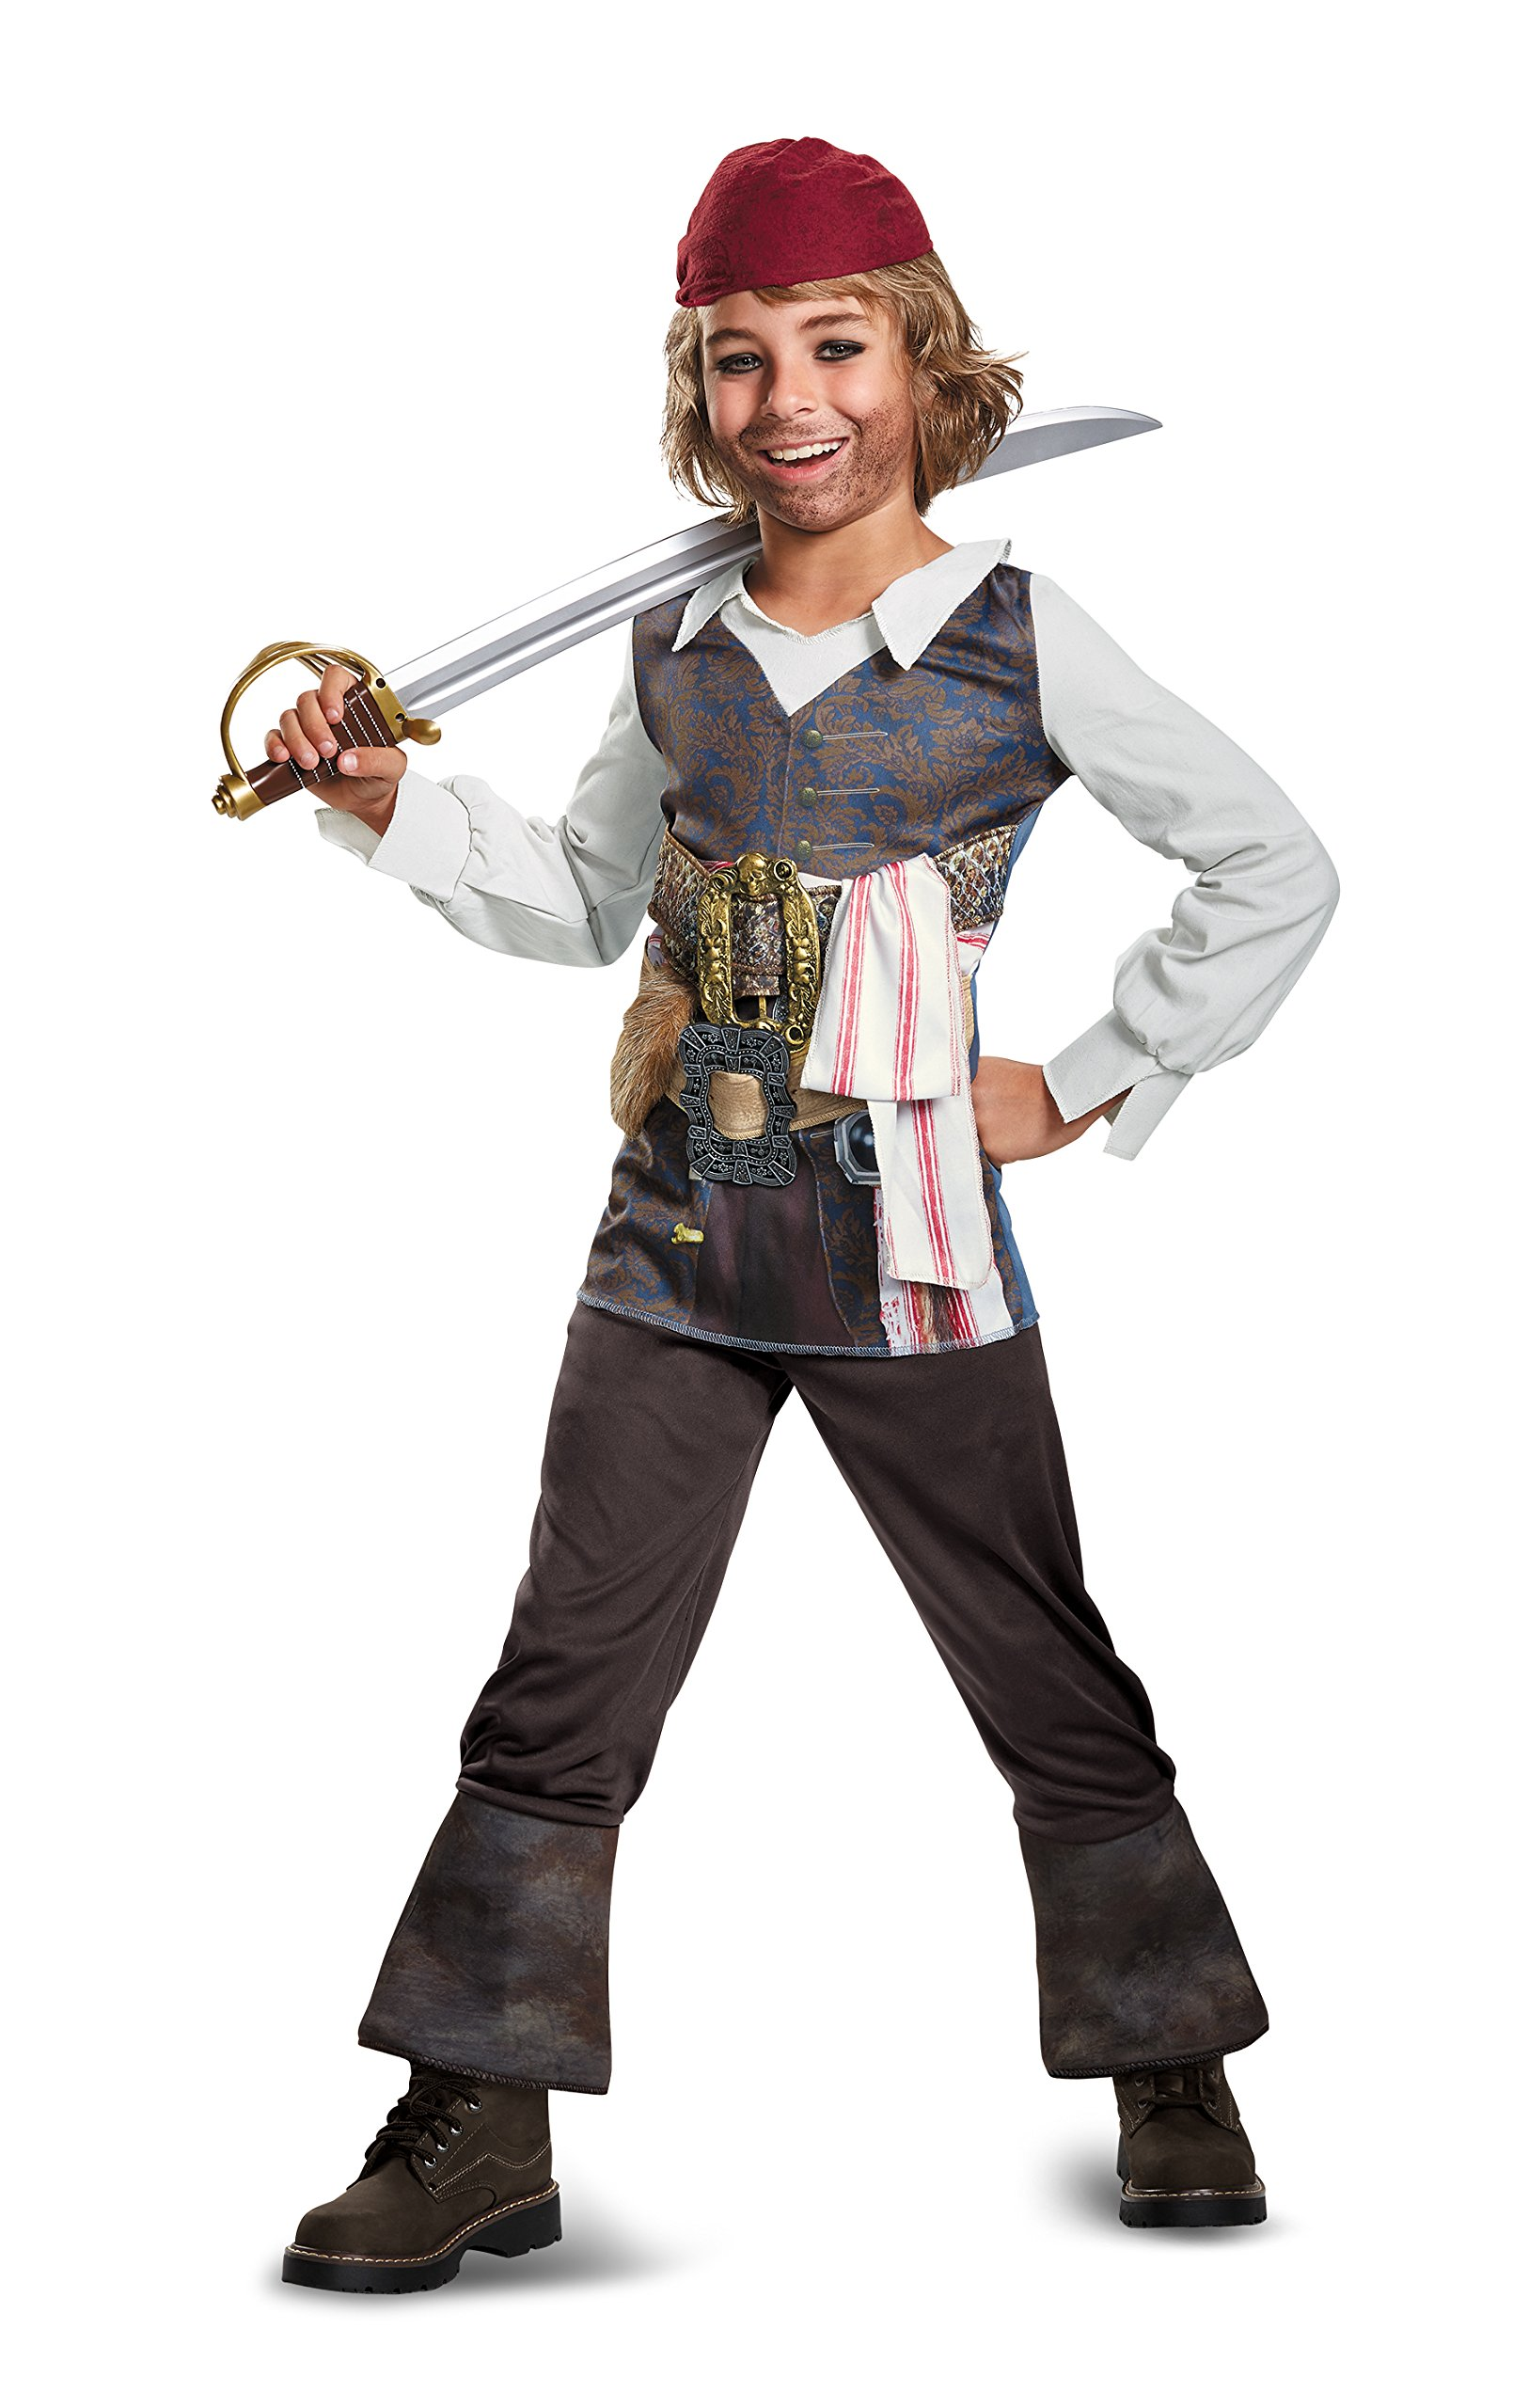 Disney POTC5 Captain Jack Sparrow Classic Costume,  Multicolor,  Medium (7-8) by Disguise